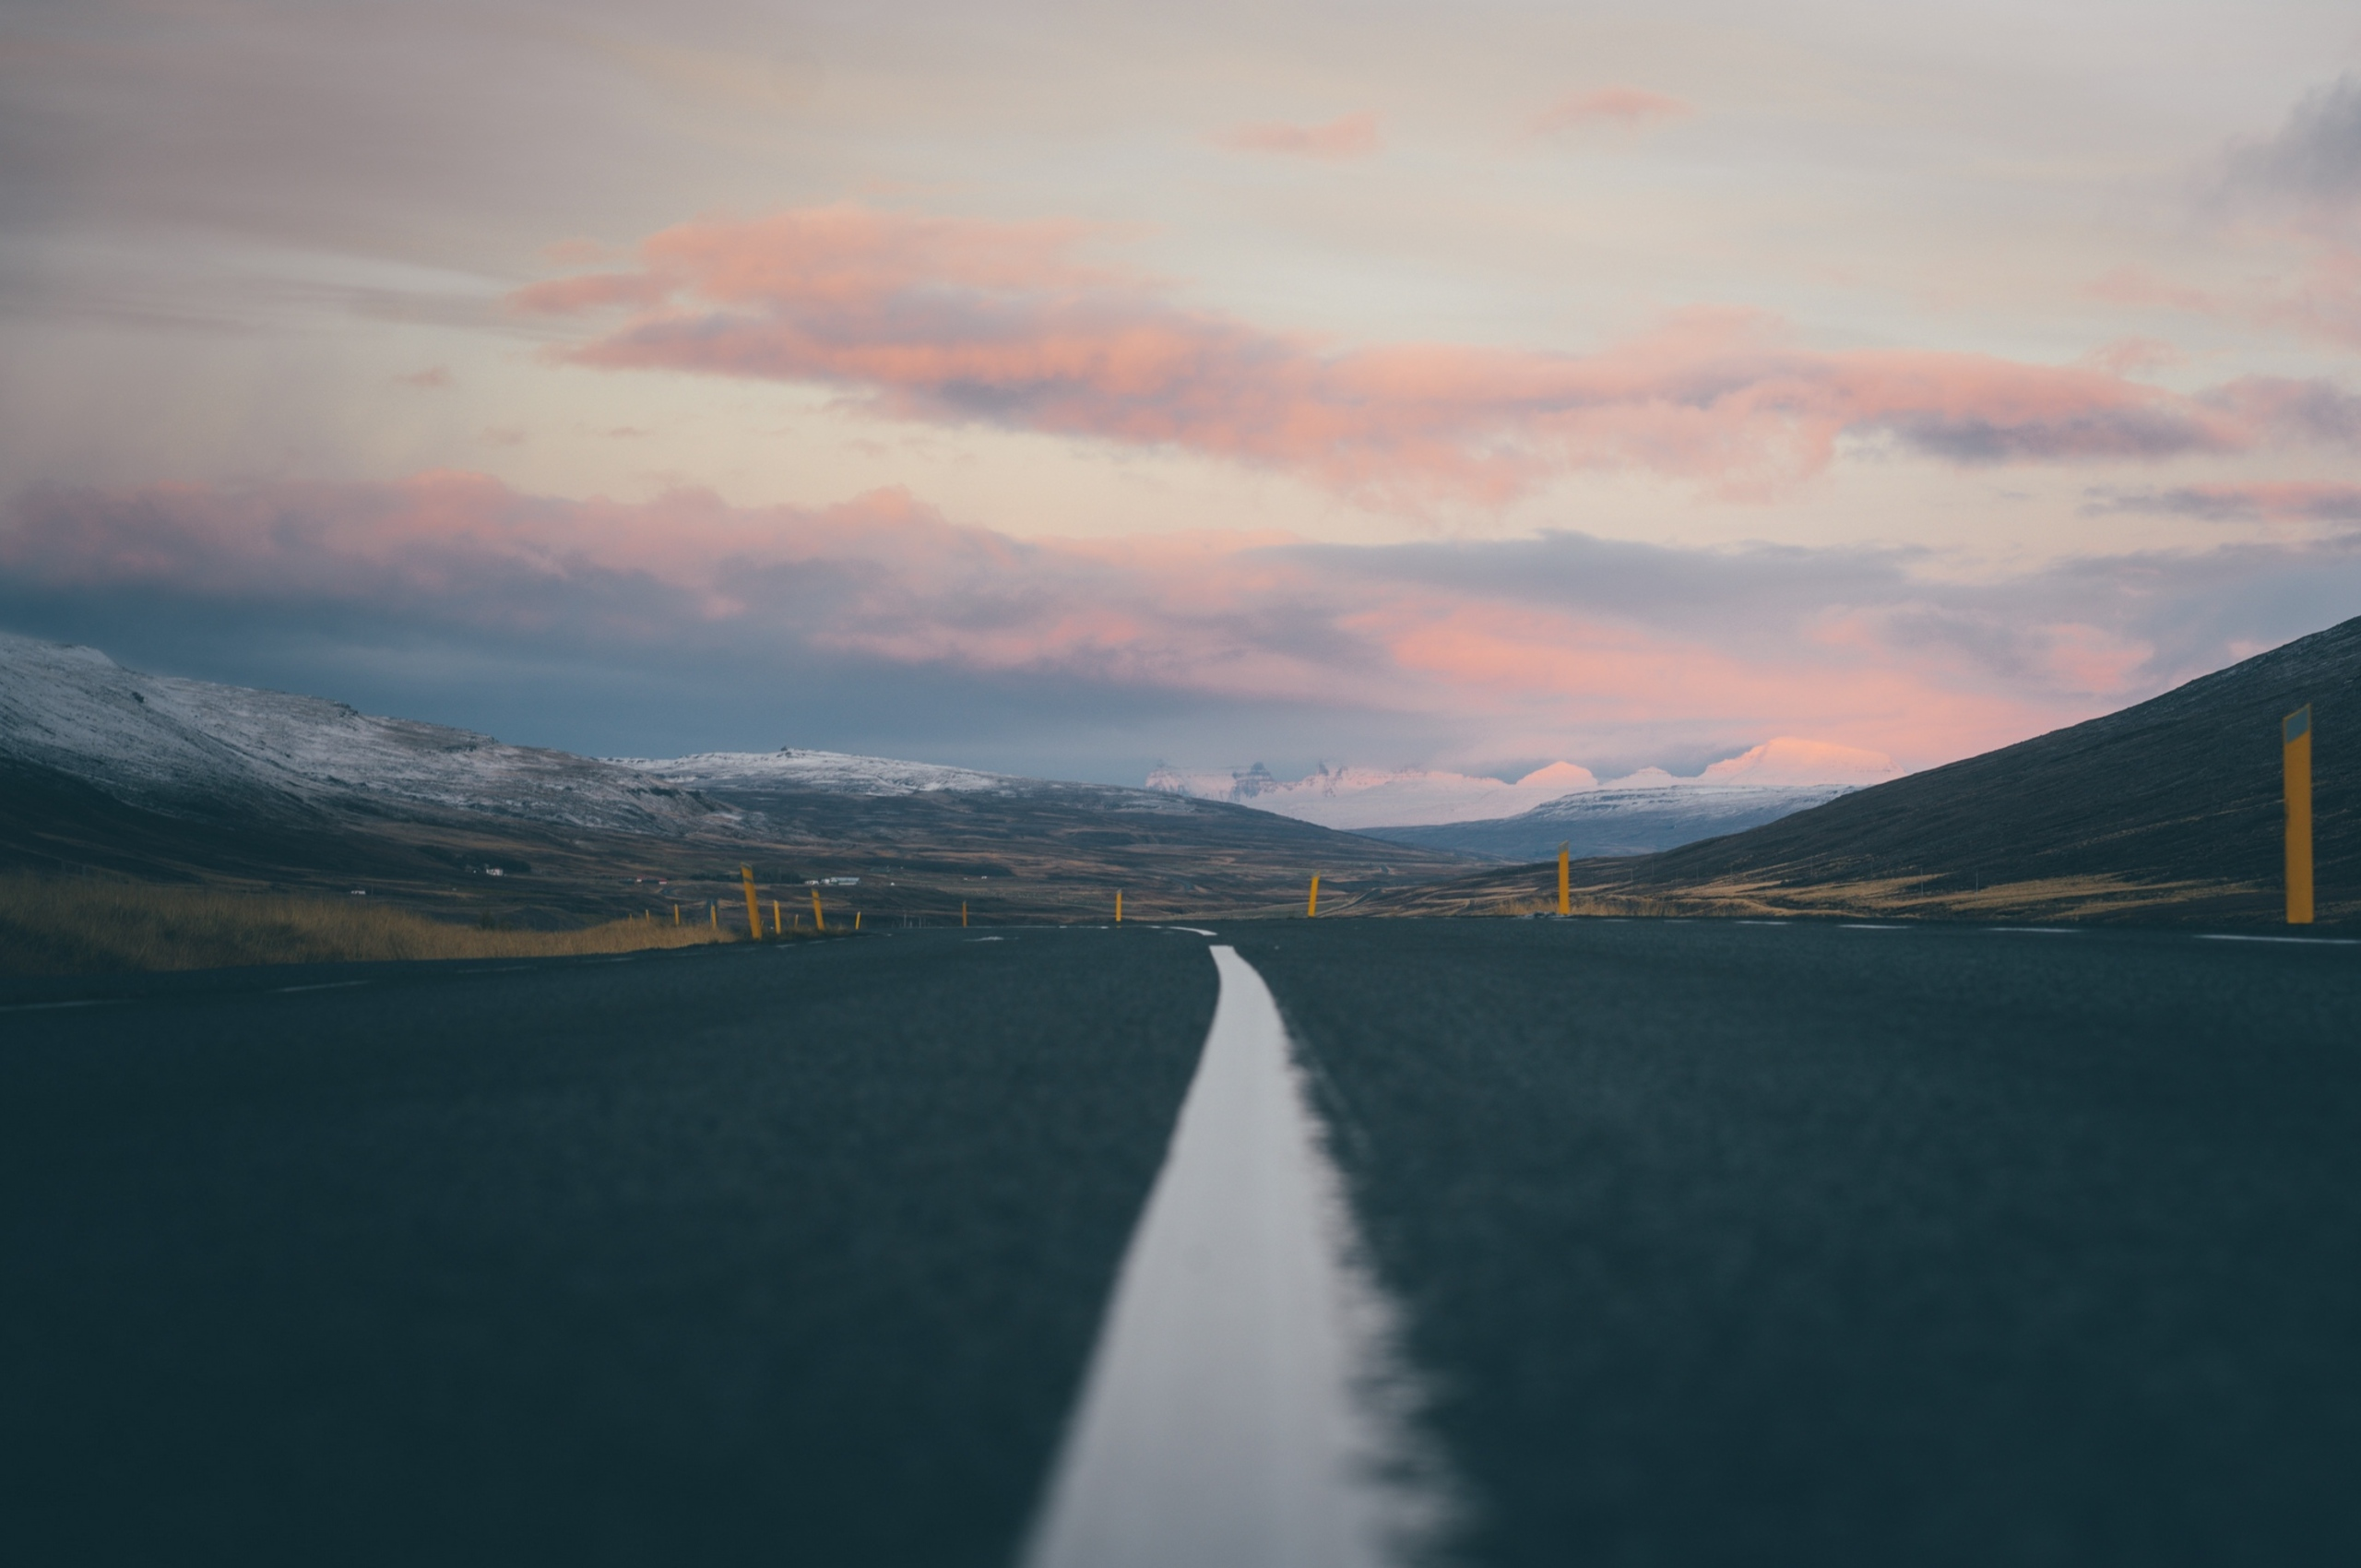 road-landscape-photography-ht.jpg